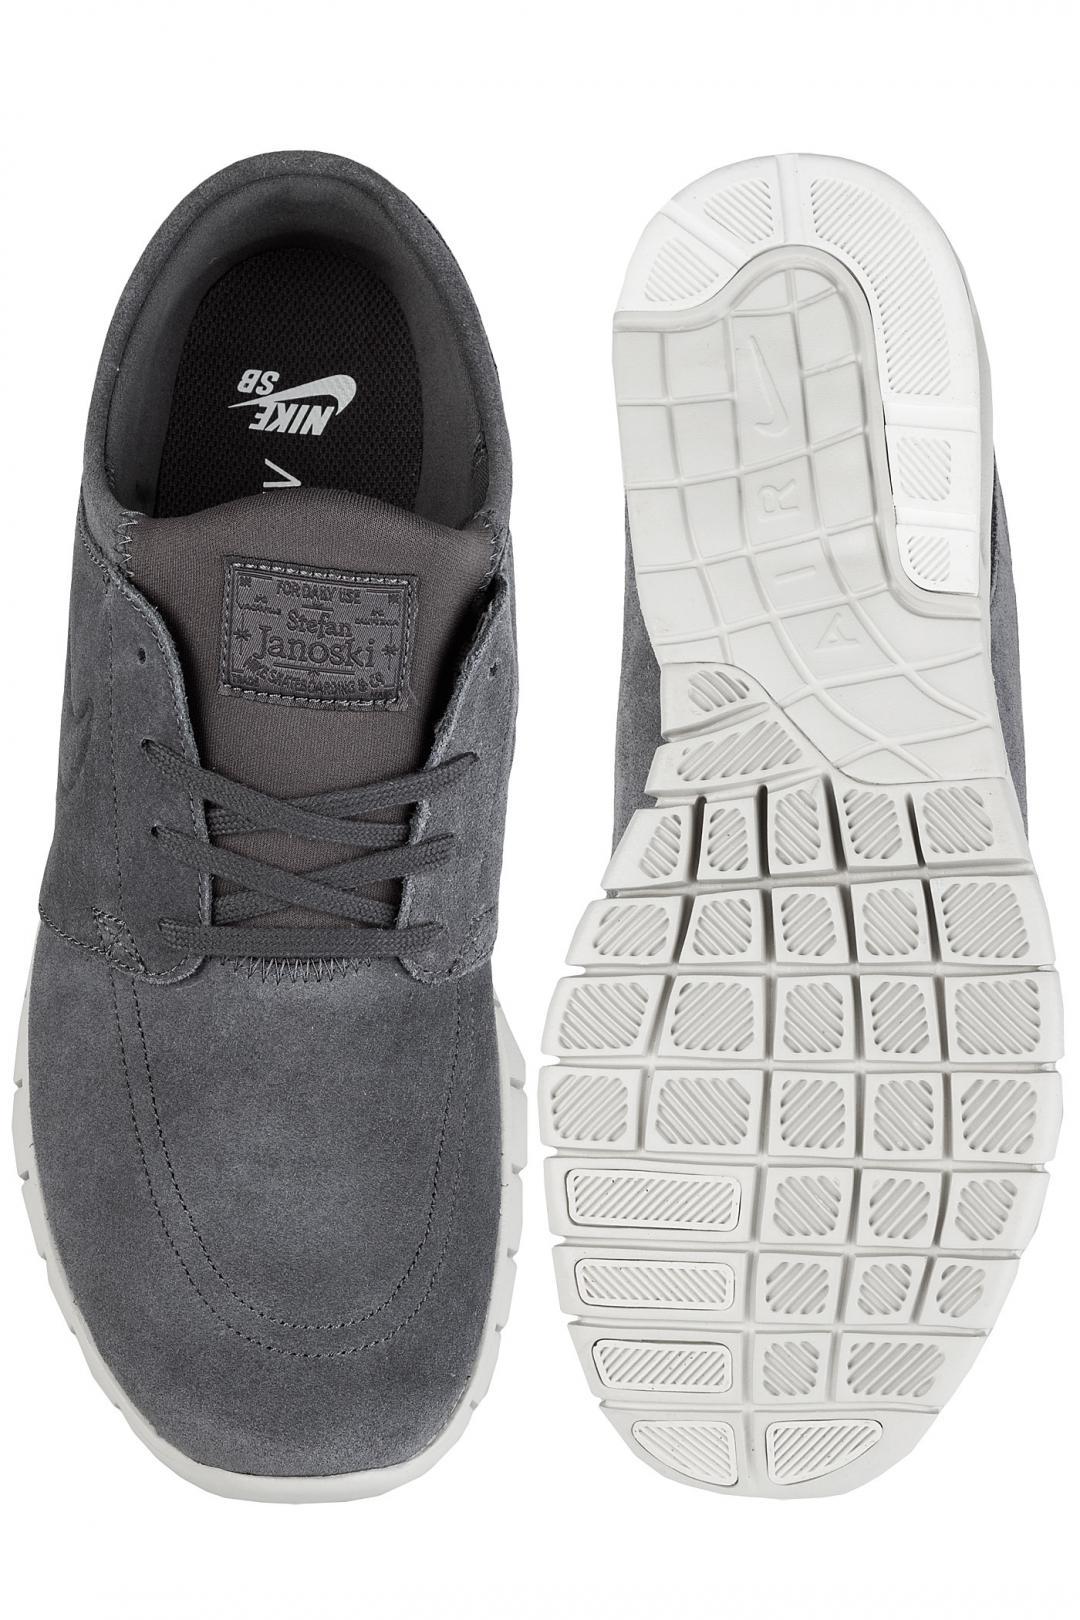 Uomo Nike SB Stefan Janoski Max Suede dark grey light bone   Sneakers low top